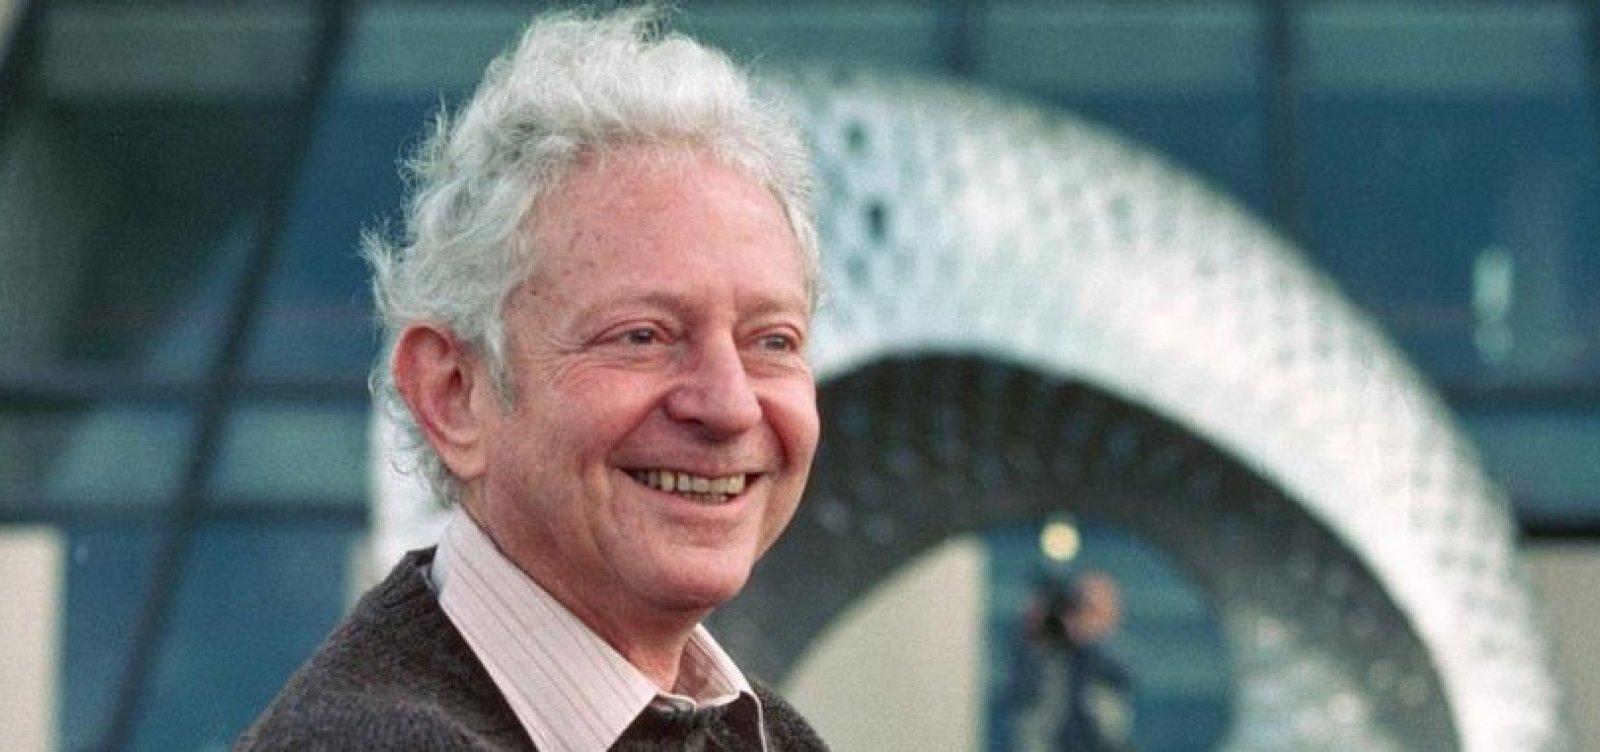 [Aos 96 anos, morre o físico vencedor do Prêmio Nobel, Leon Lederman]